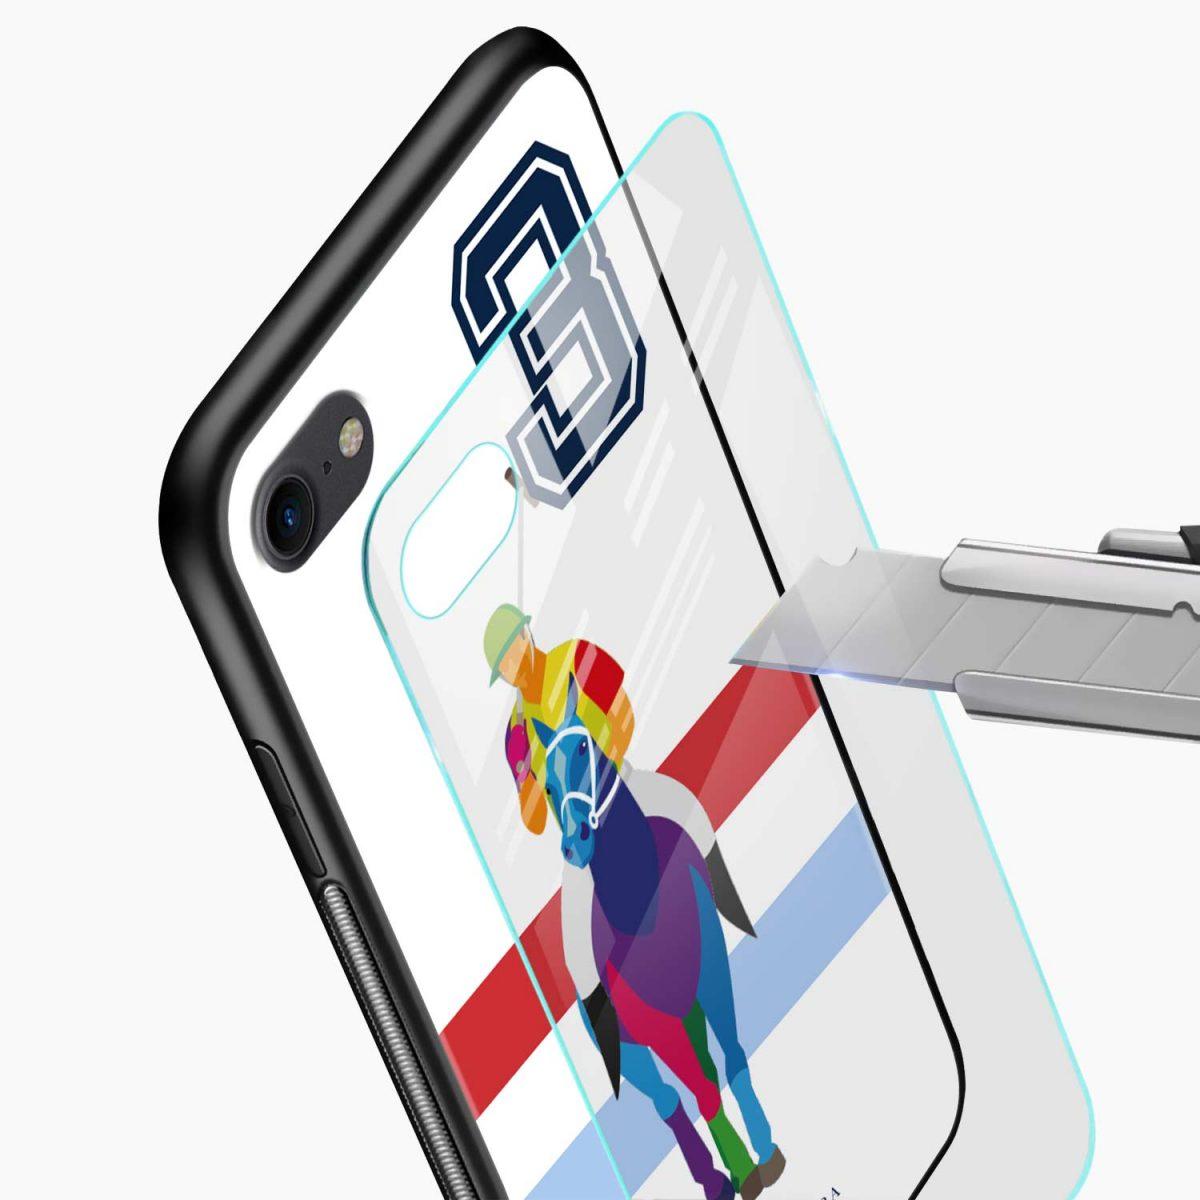 multicolor sant barbara polo glass view apple iphone 6 7 8 se back cover